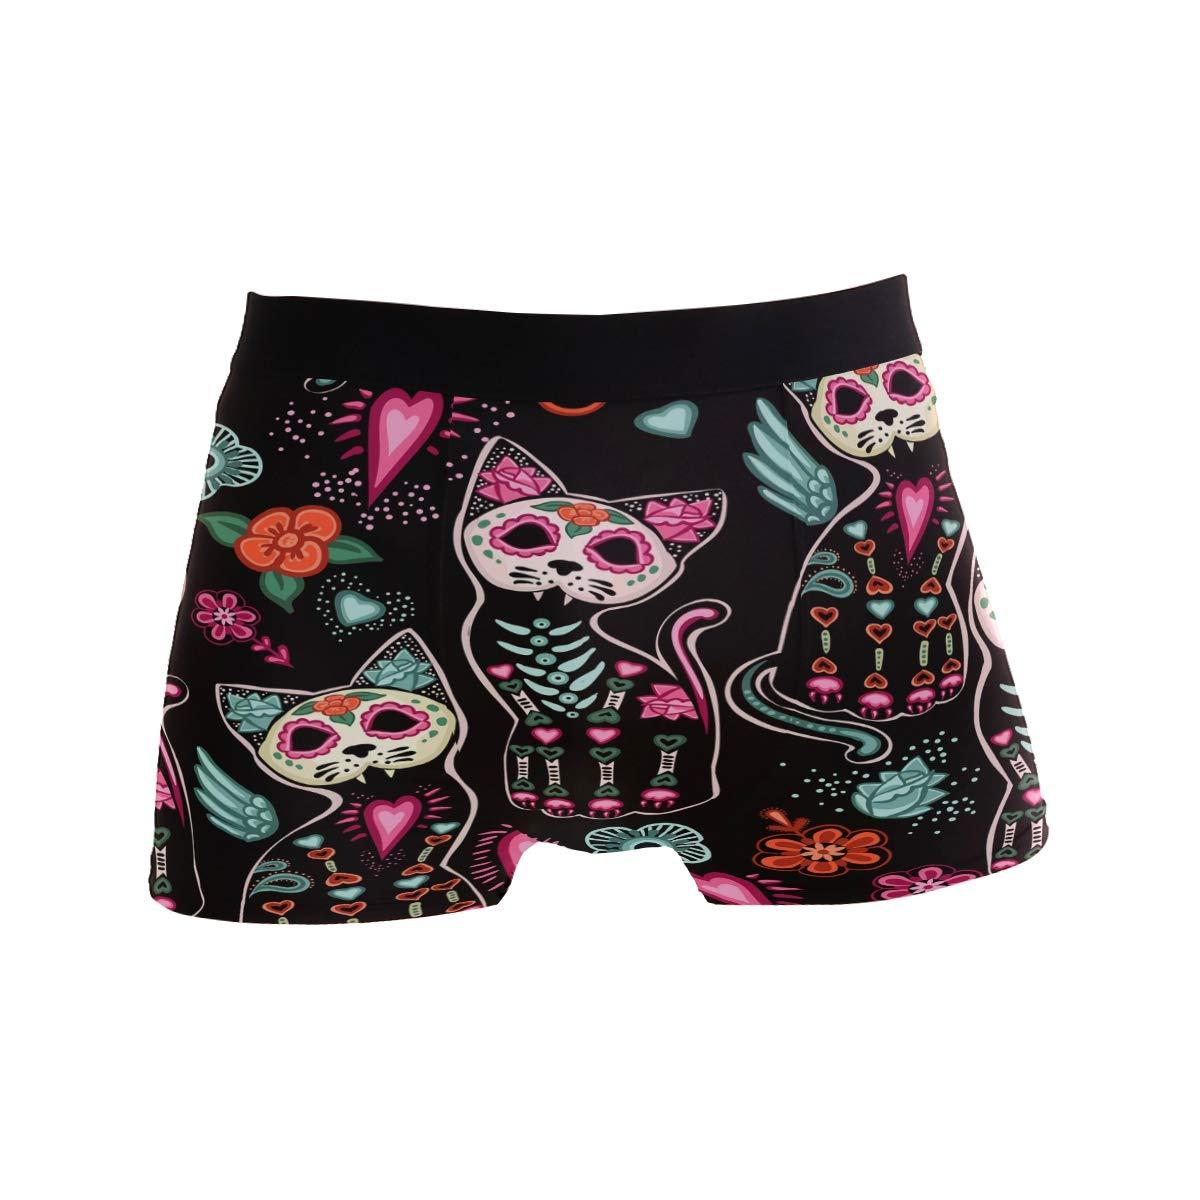 ZZKKO Skull Mens Boxer Briefs Underwear Breathable Stretch Boxer Trunk with Pouch S-XL